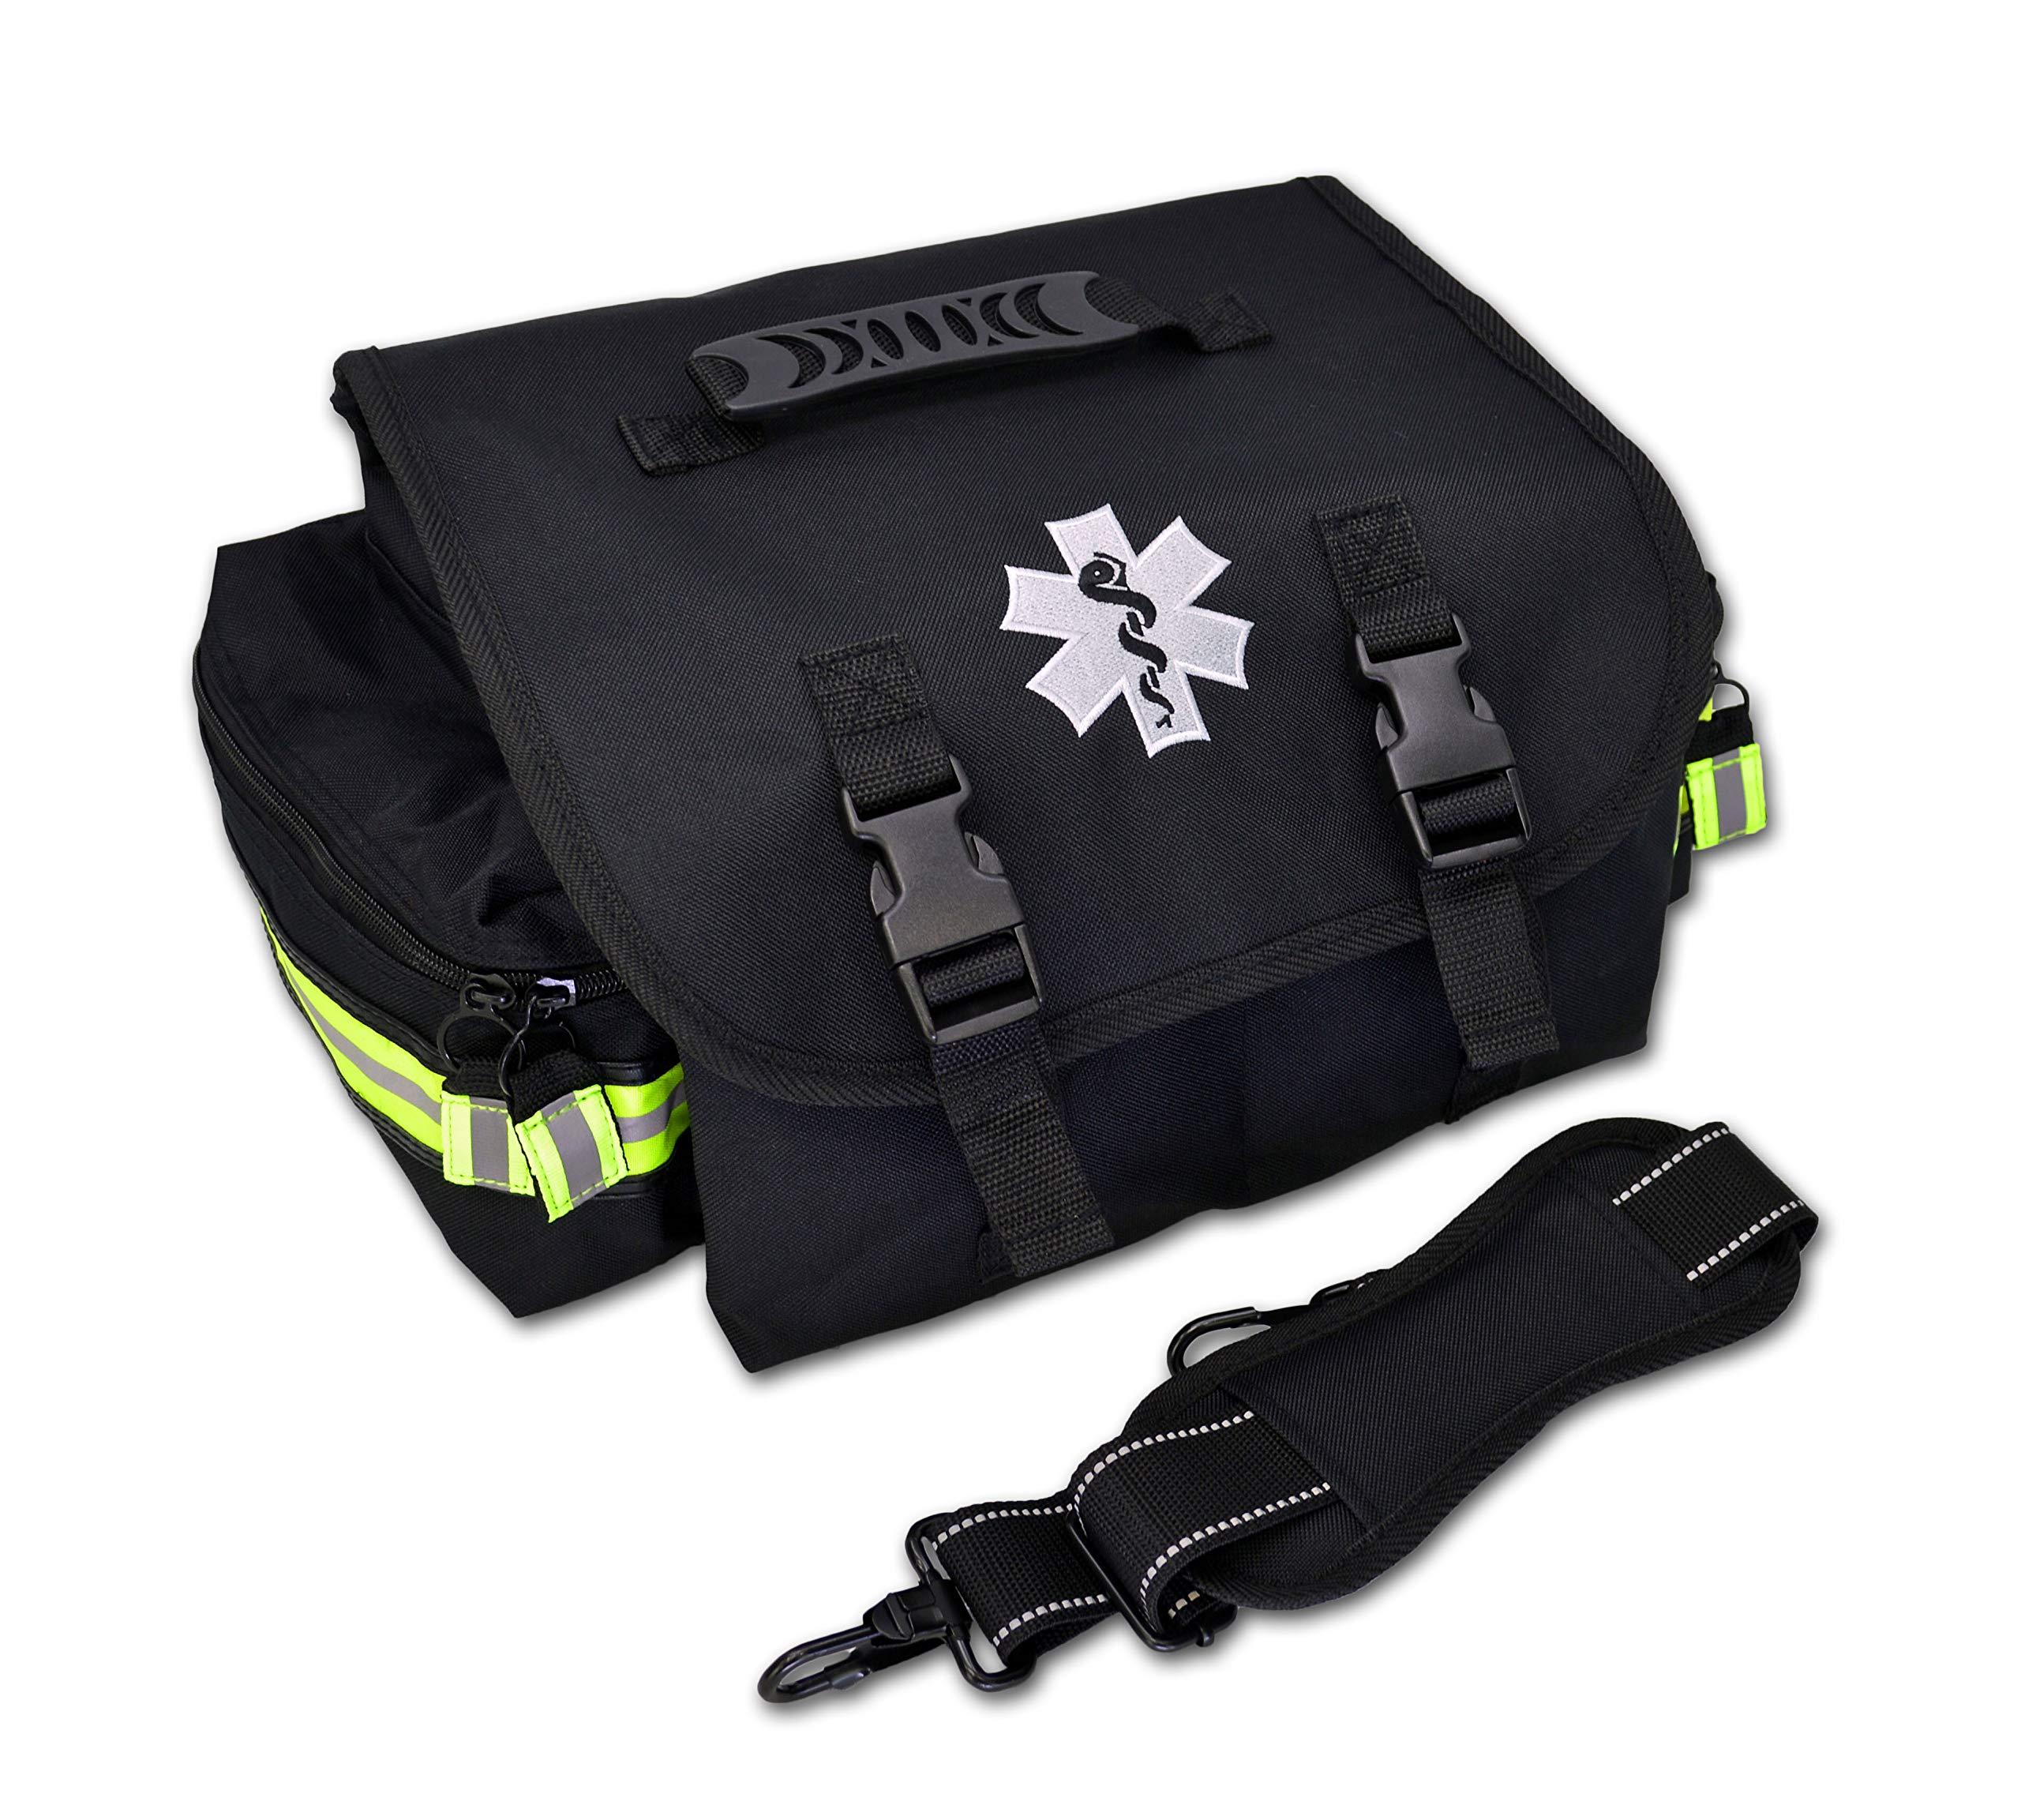 Lightning X Small EMT Medic First Responder Trauma EMS Jump Bag w/Dividers (Stealth Black)